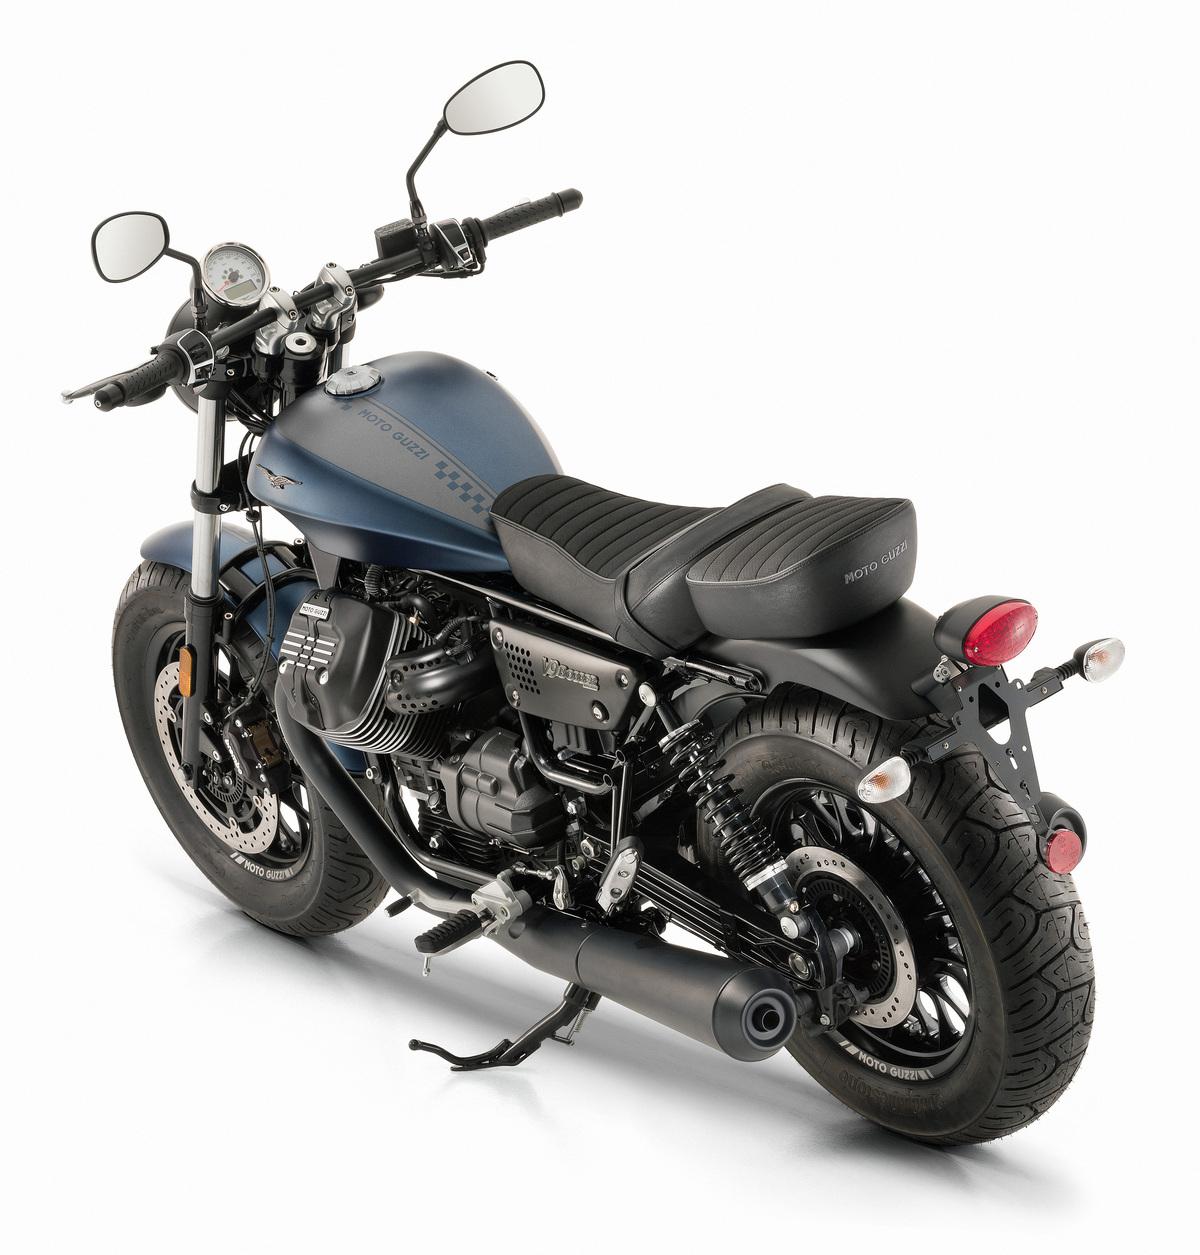 Moto Guzzi V9 Bobber 2018 20 Prezzo E Scheda Tecnica Moto It